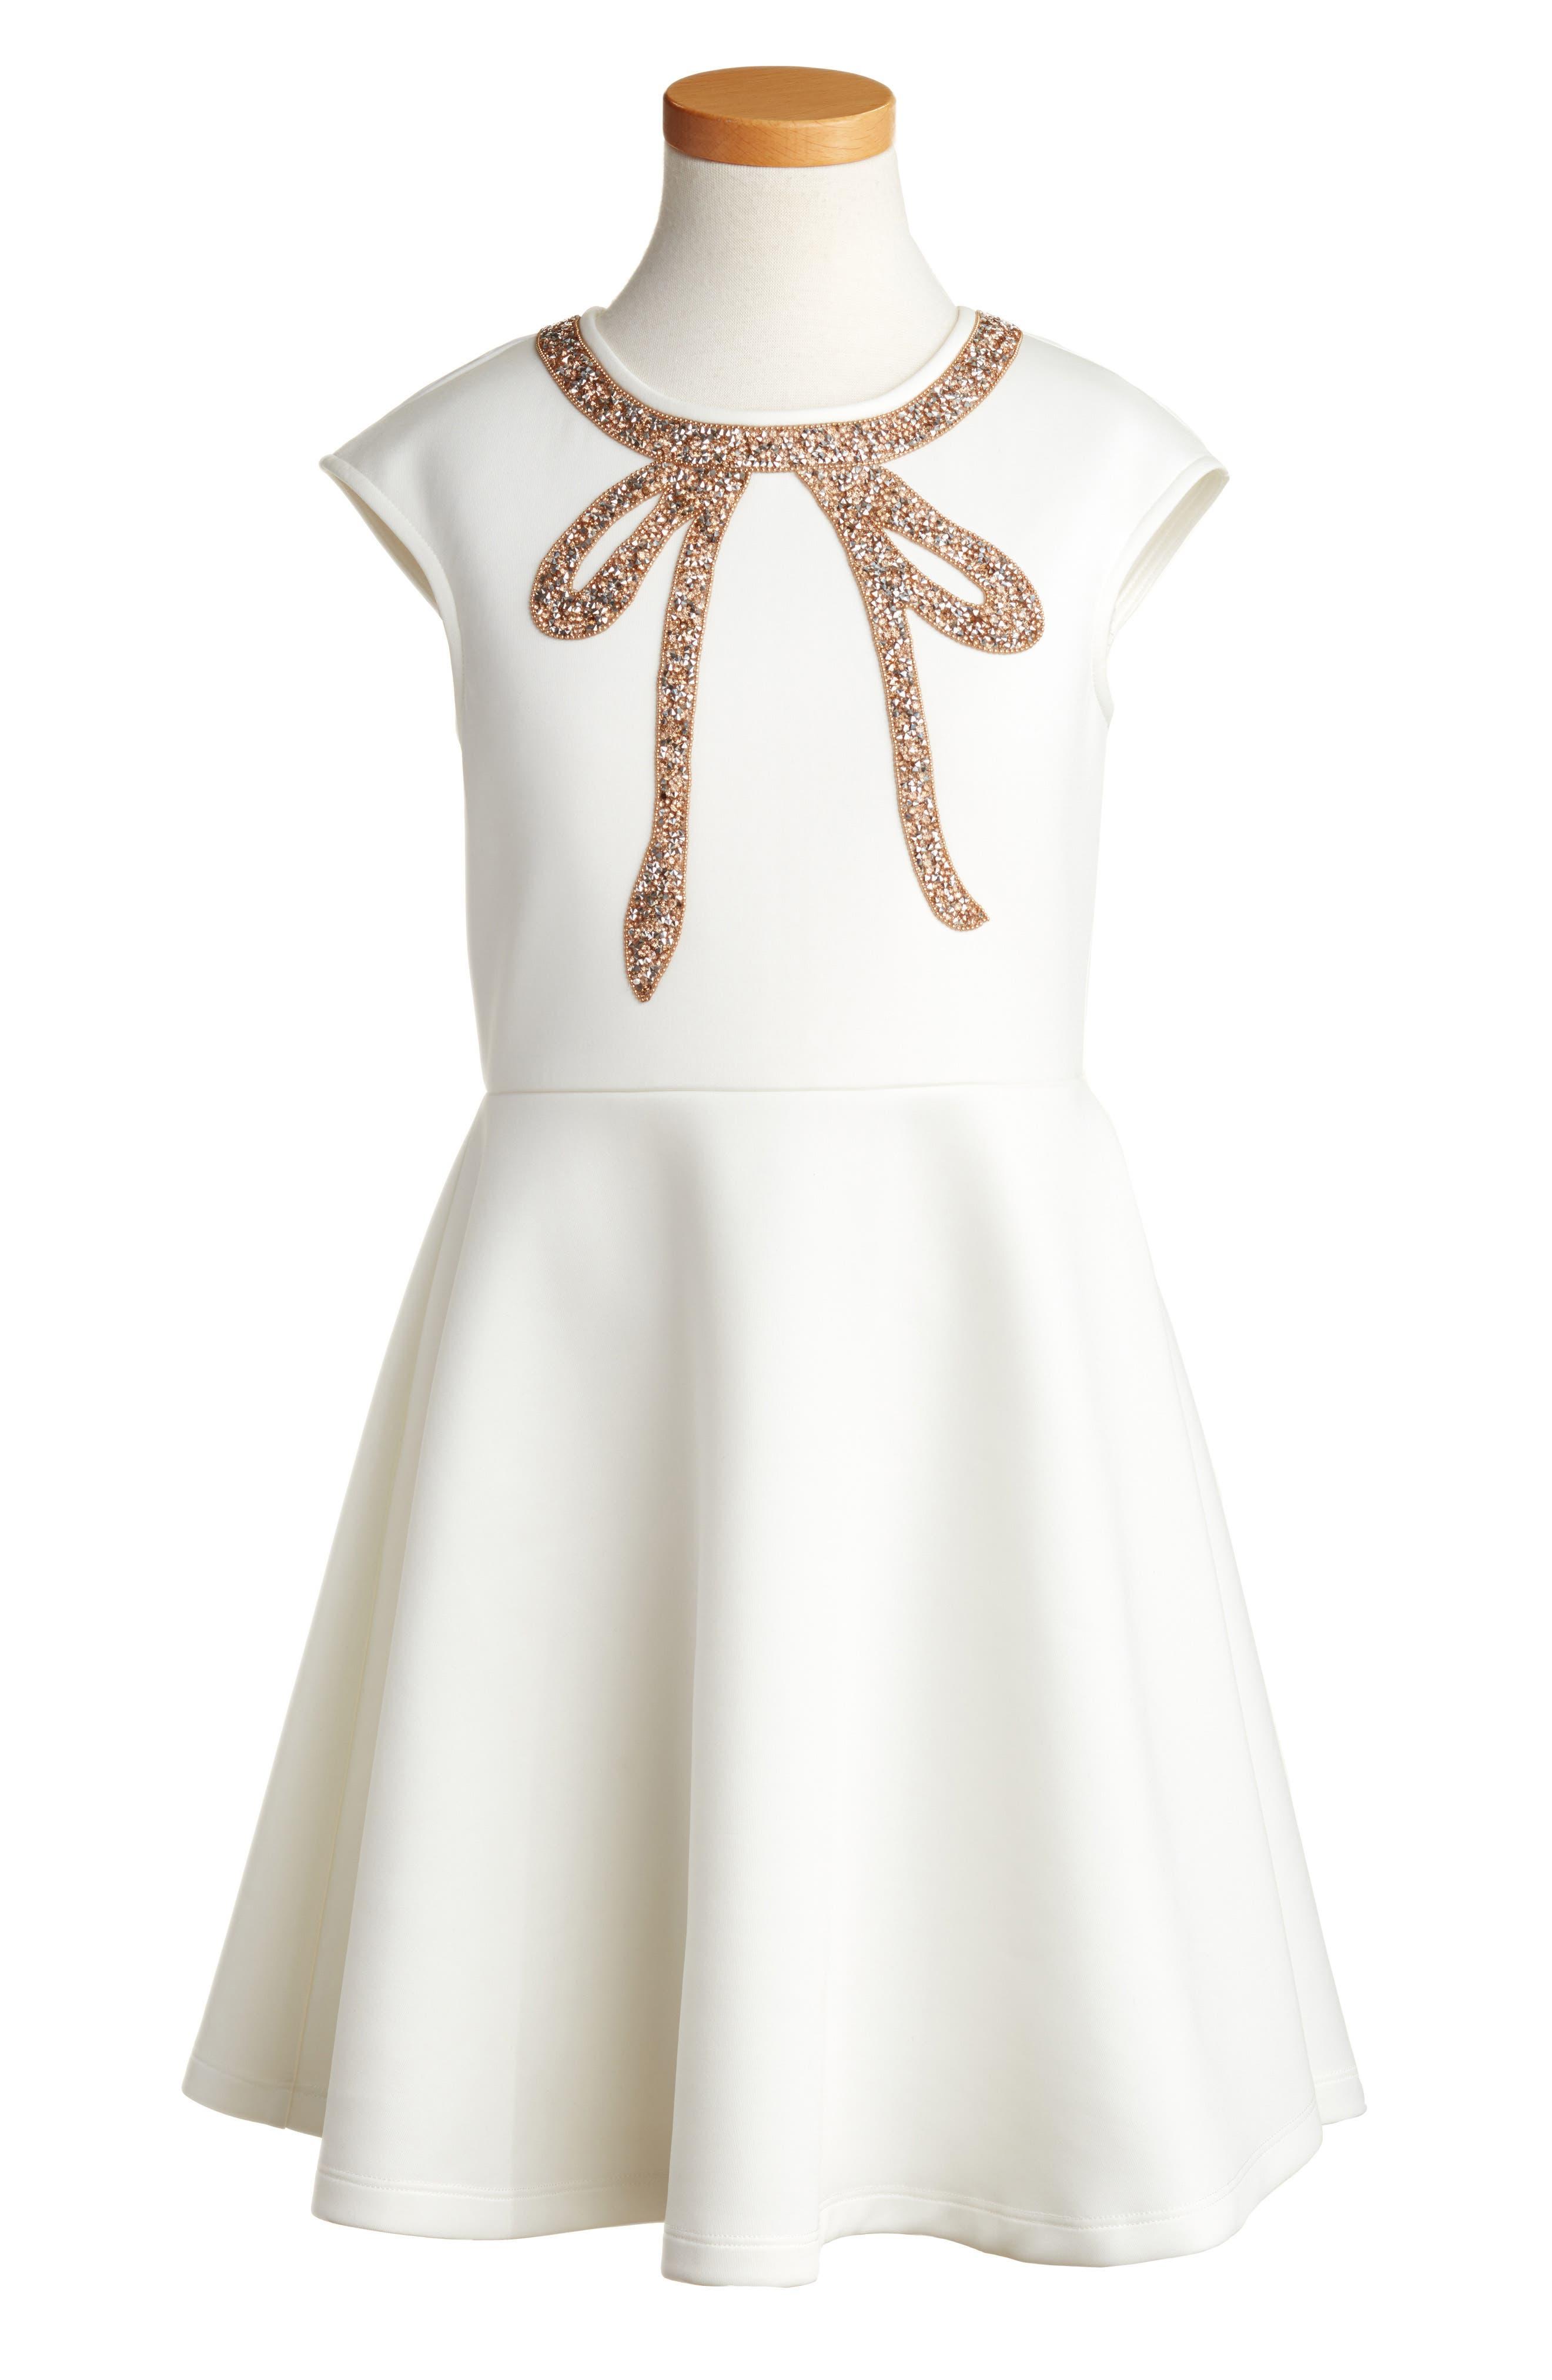 Alternate Image 1 Selected - Hannah Banana Cap Sleeve Bow Dress (Big Girls)